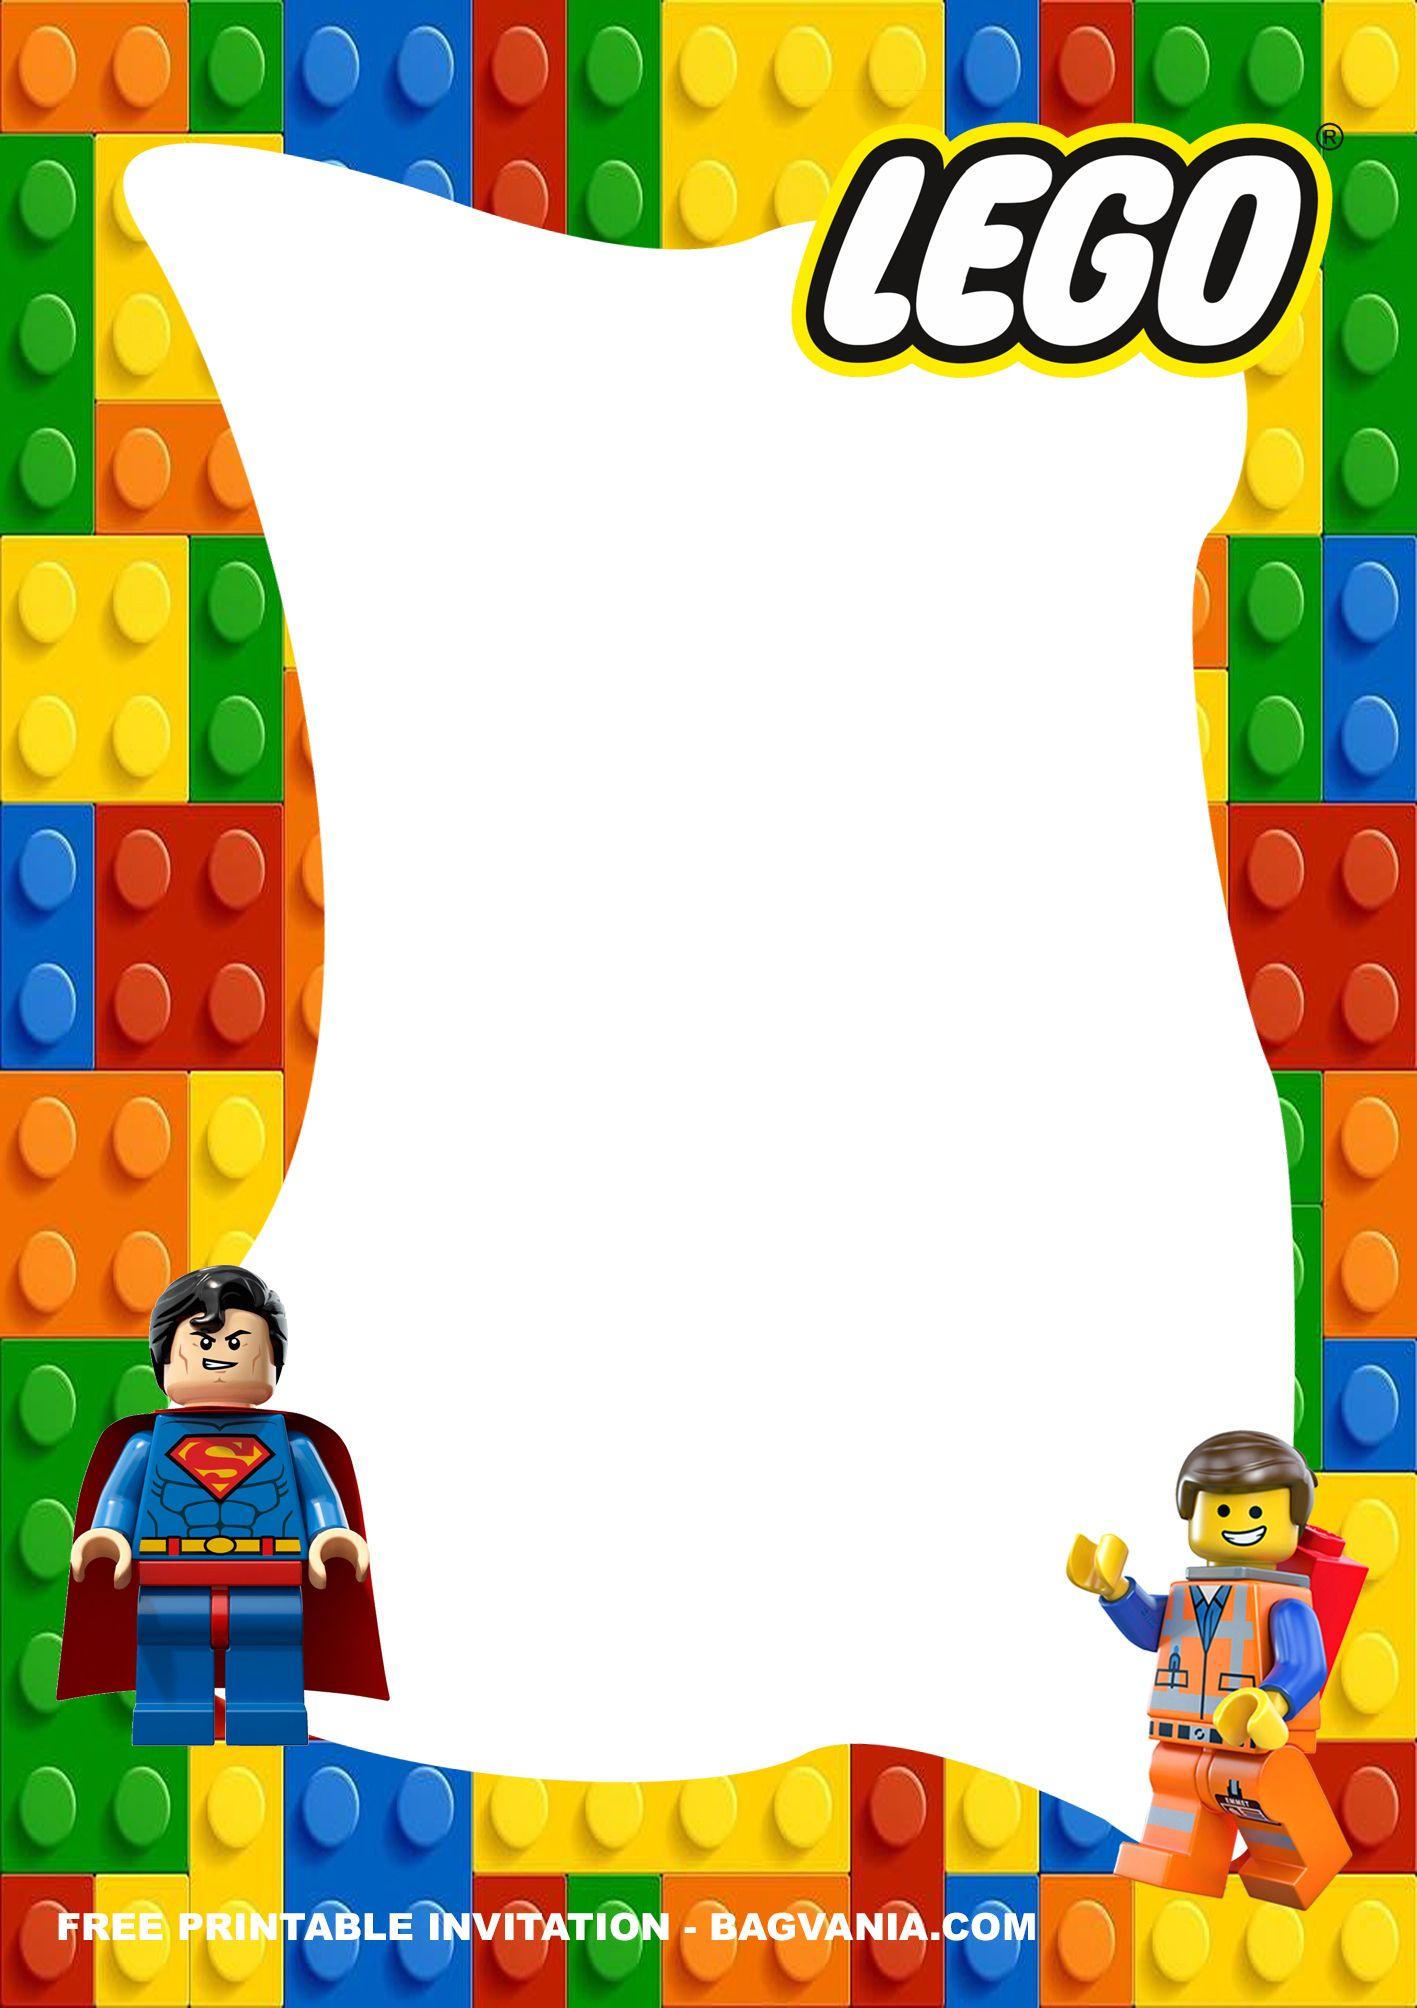 Free Printable Lego Superheroes Birthday Invitation Templates Superhero Birthday Invitations Lego Birthday Invitations Lego Birthday